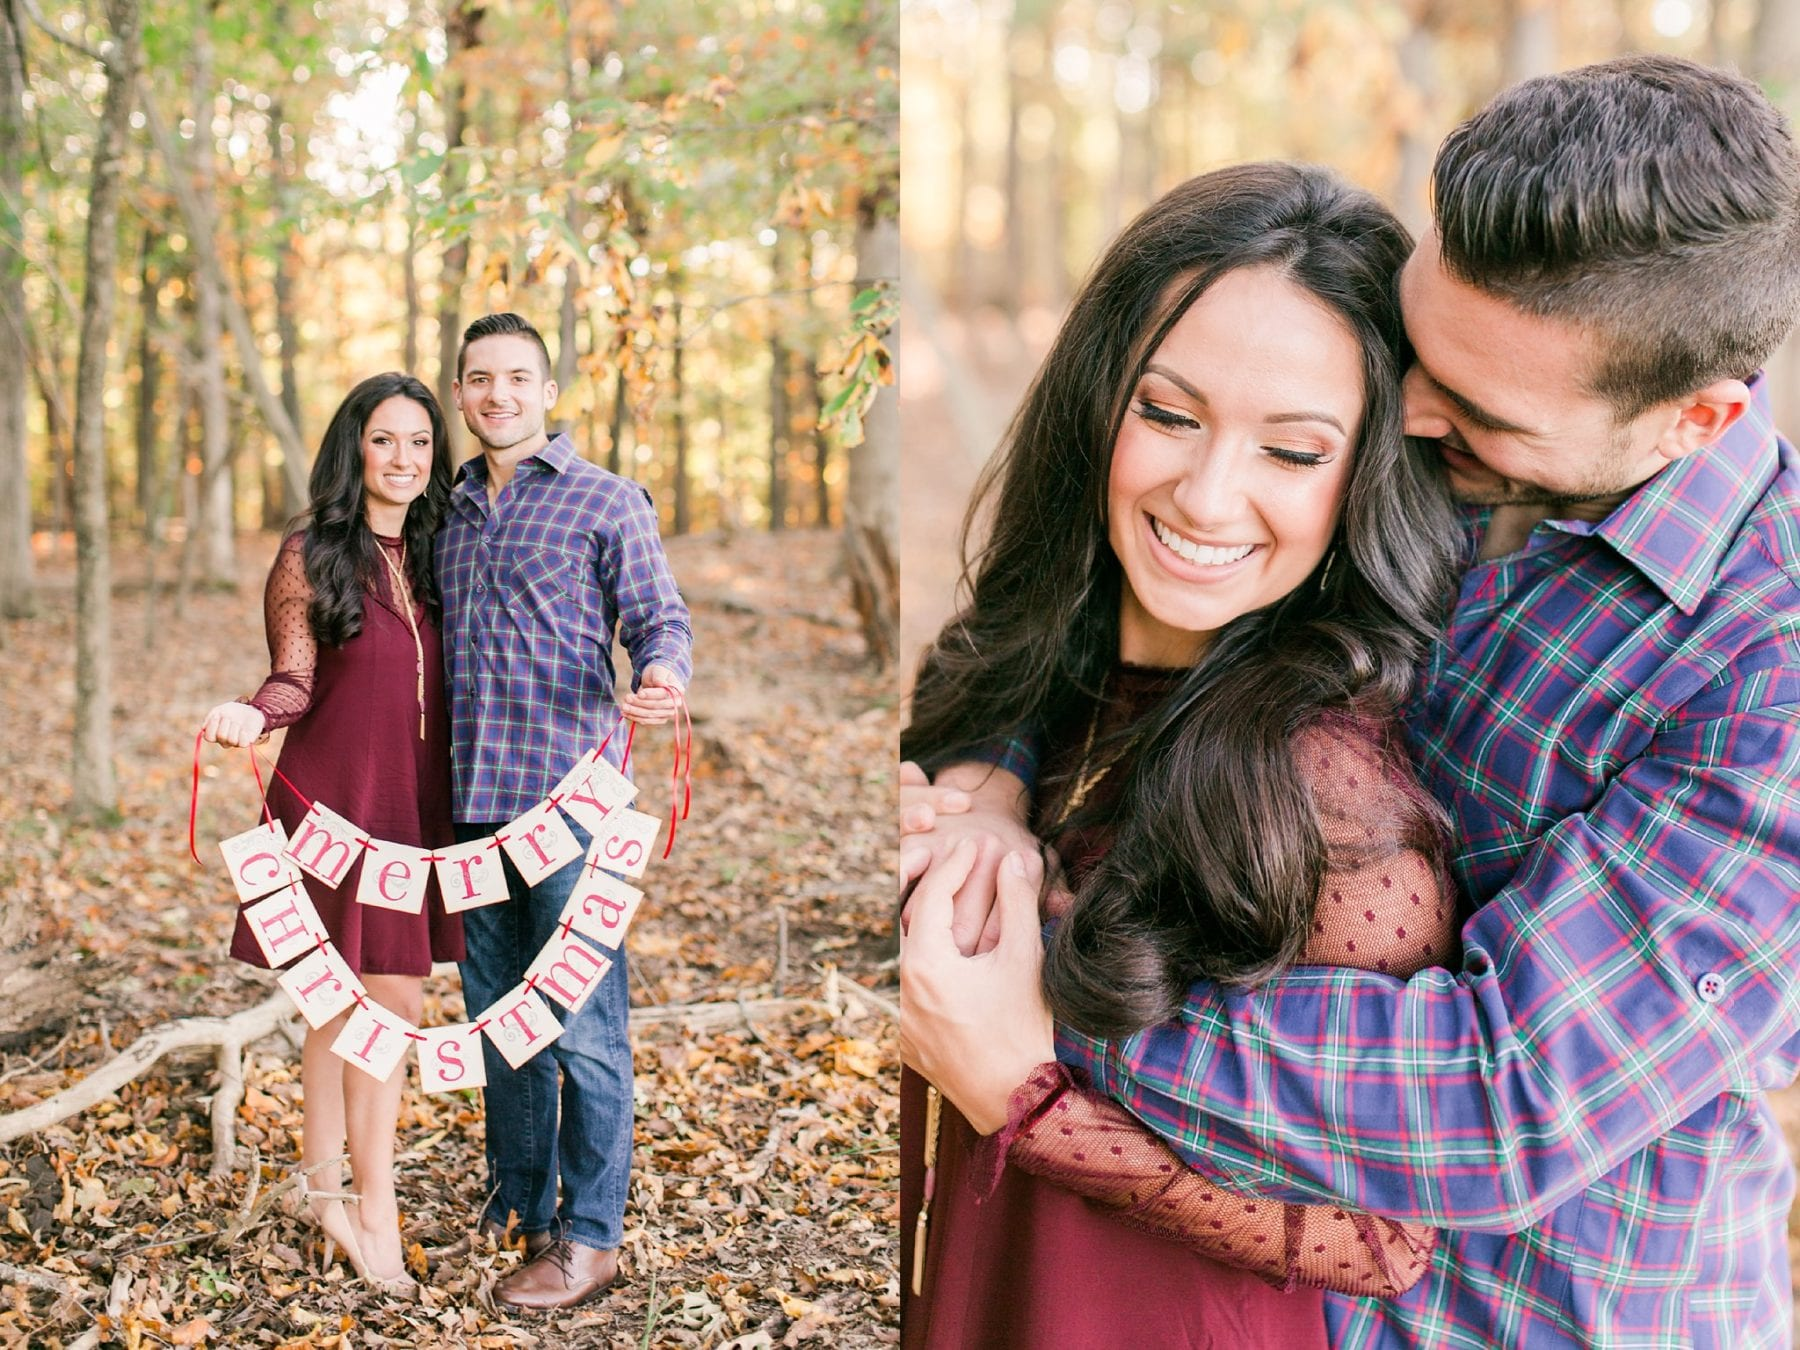 Manassas Battlefield Portraits Virginia Wedding Photographer Megan Kelsey Photography Lianne & Chris-57.jpg